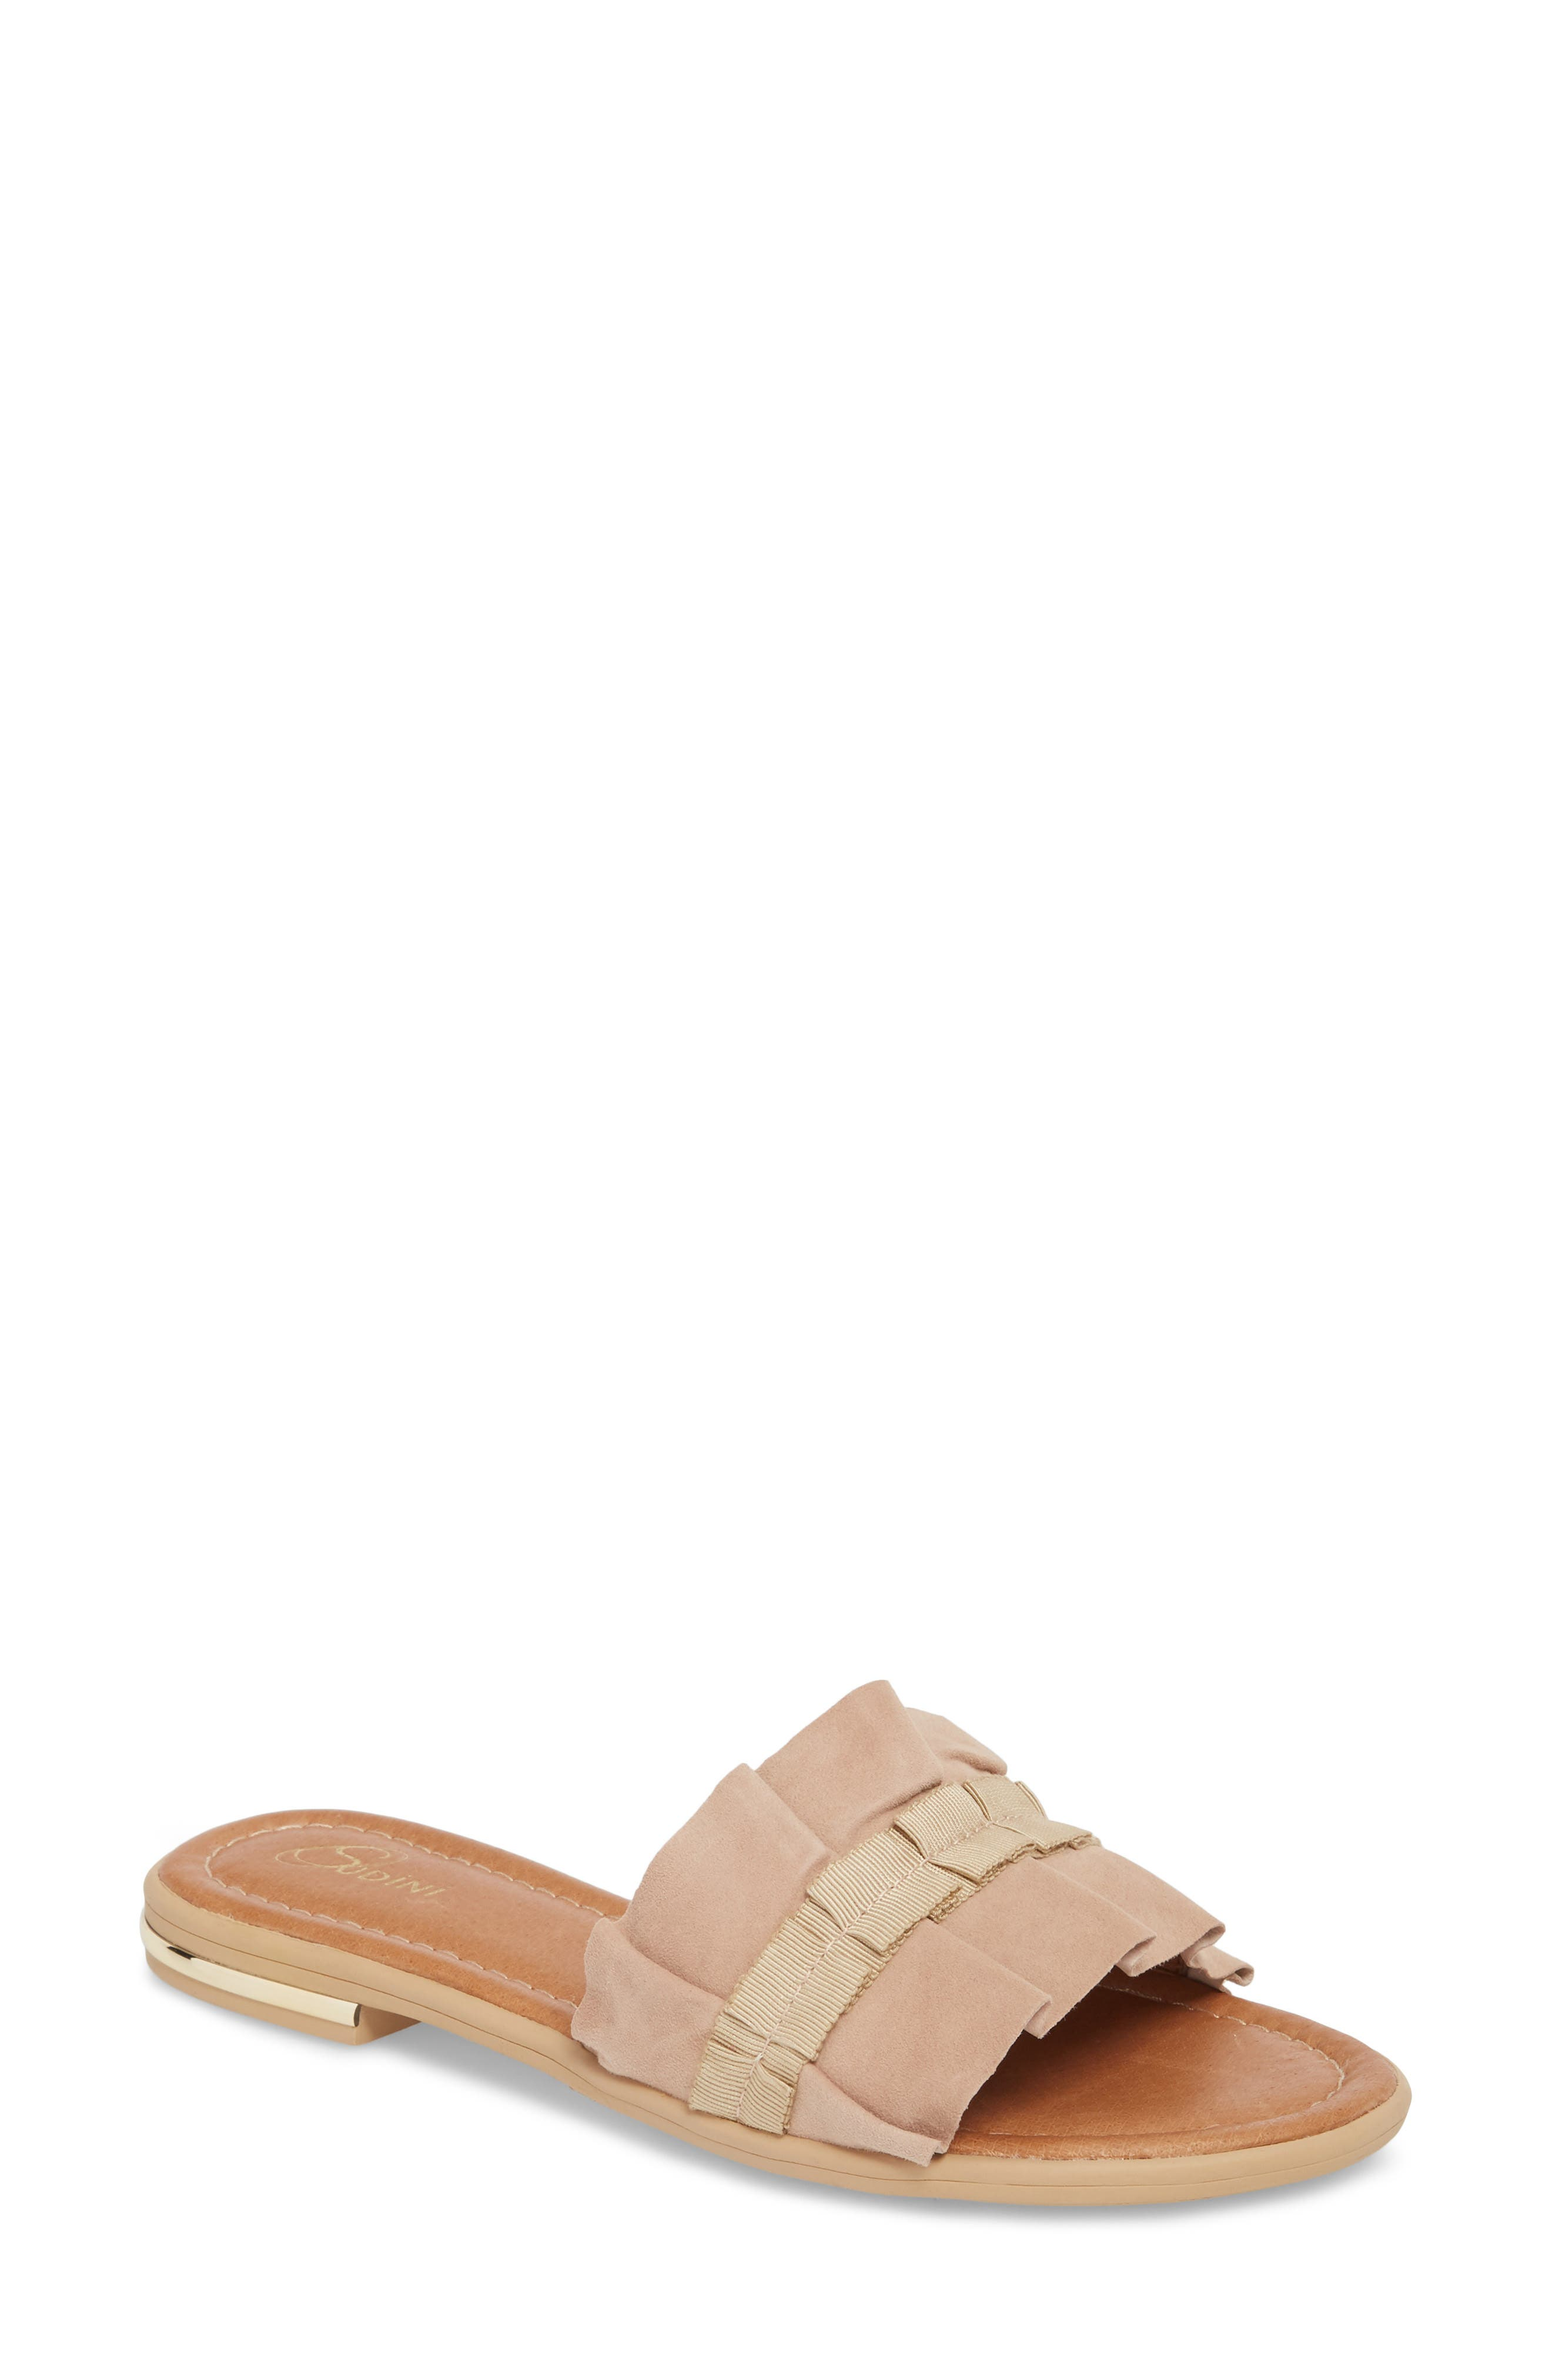 Ravenna Slide Sandal,                             Main thumbnail 1, color,                             NUDE SUEDE